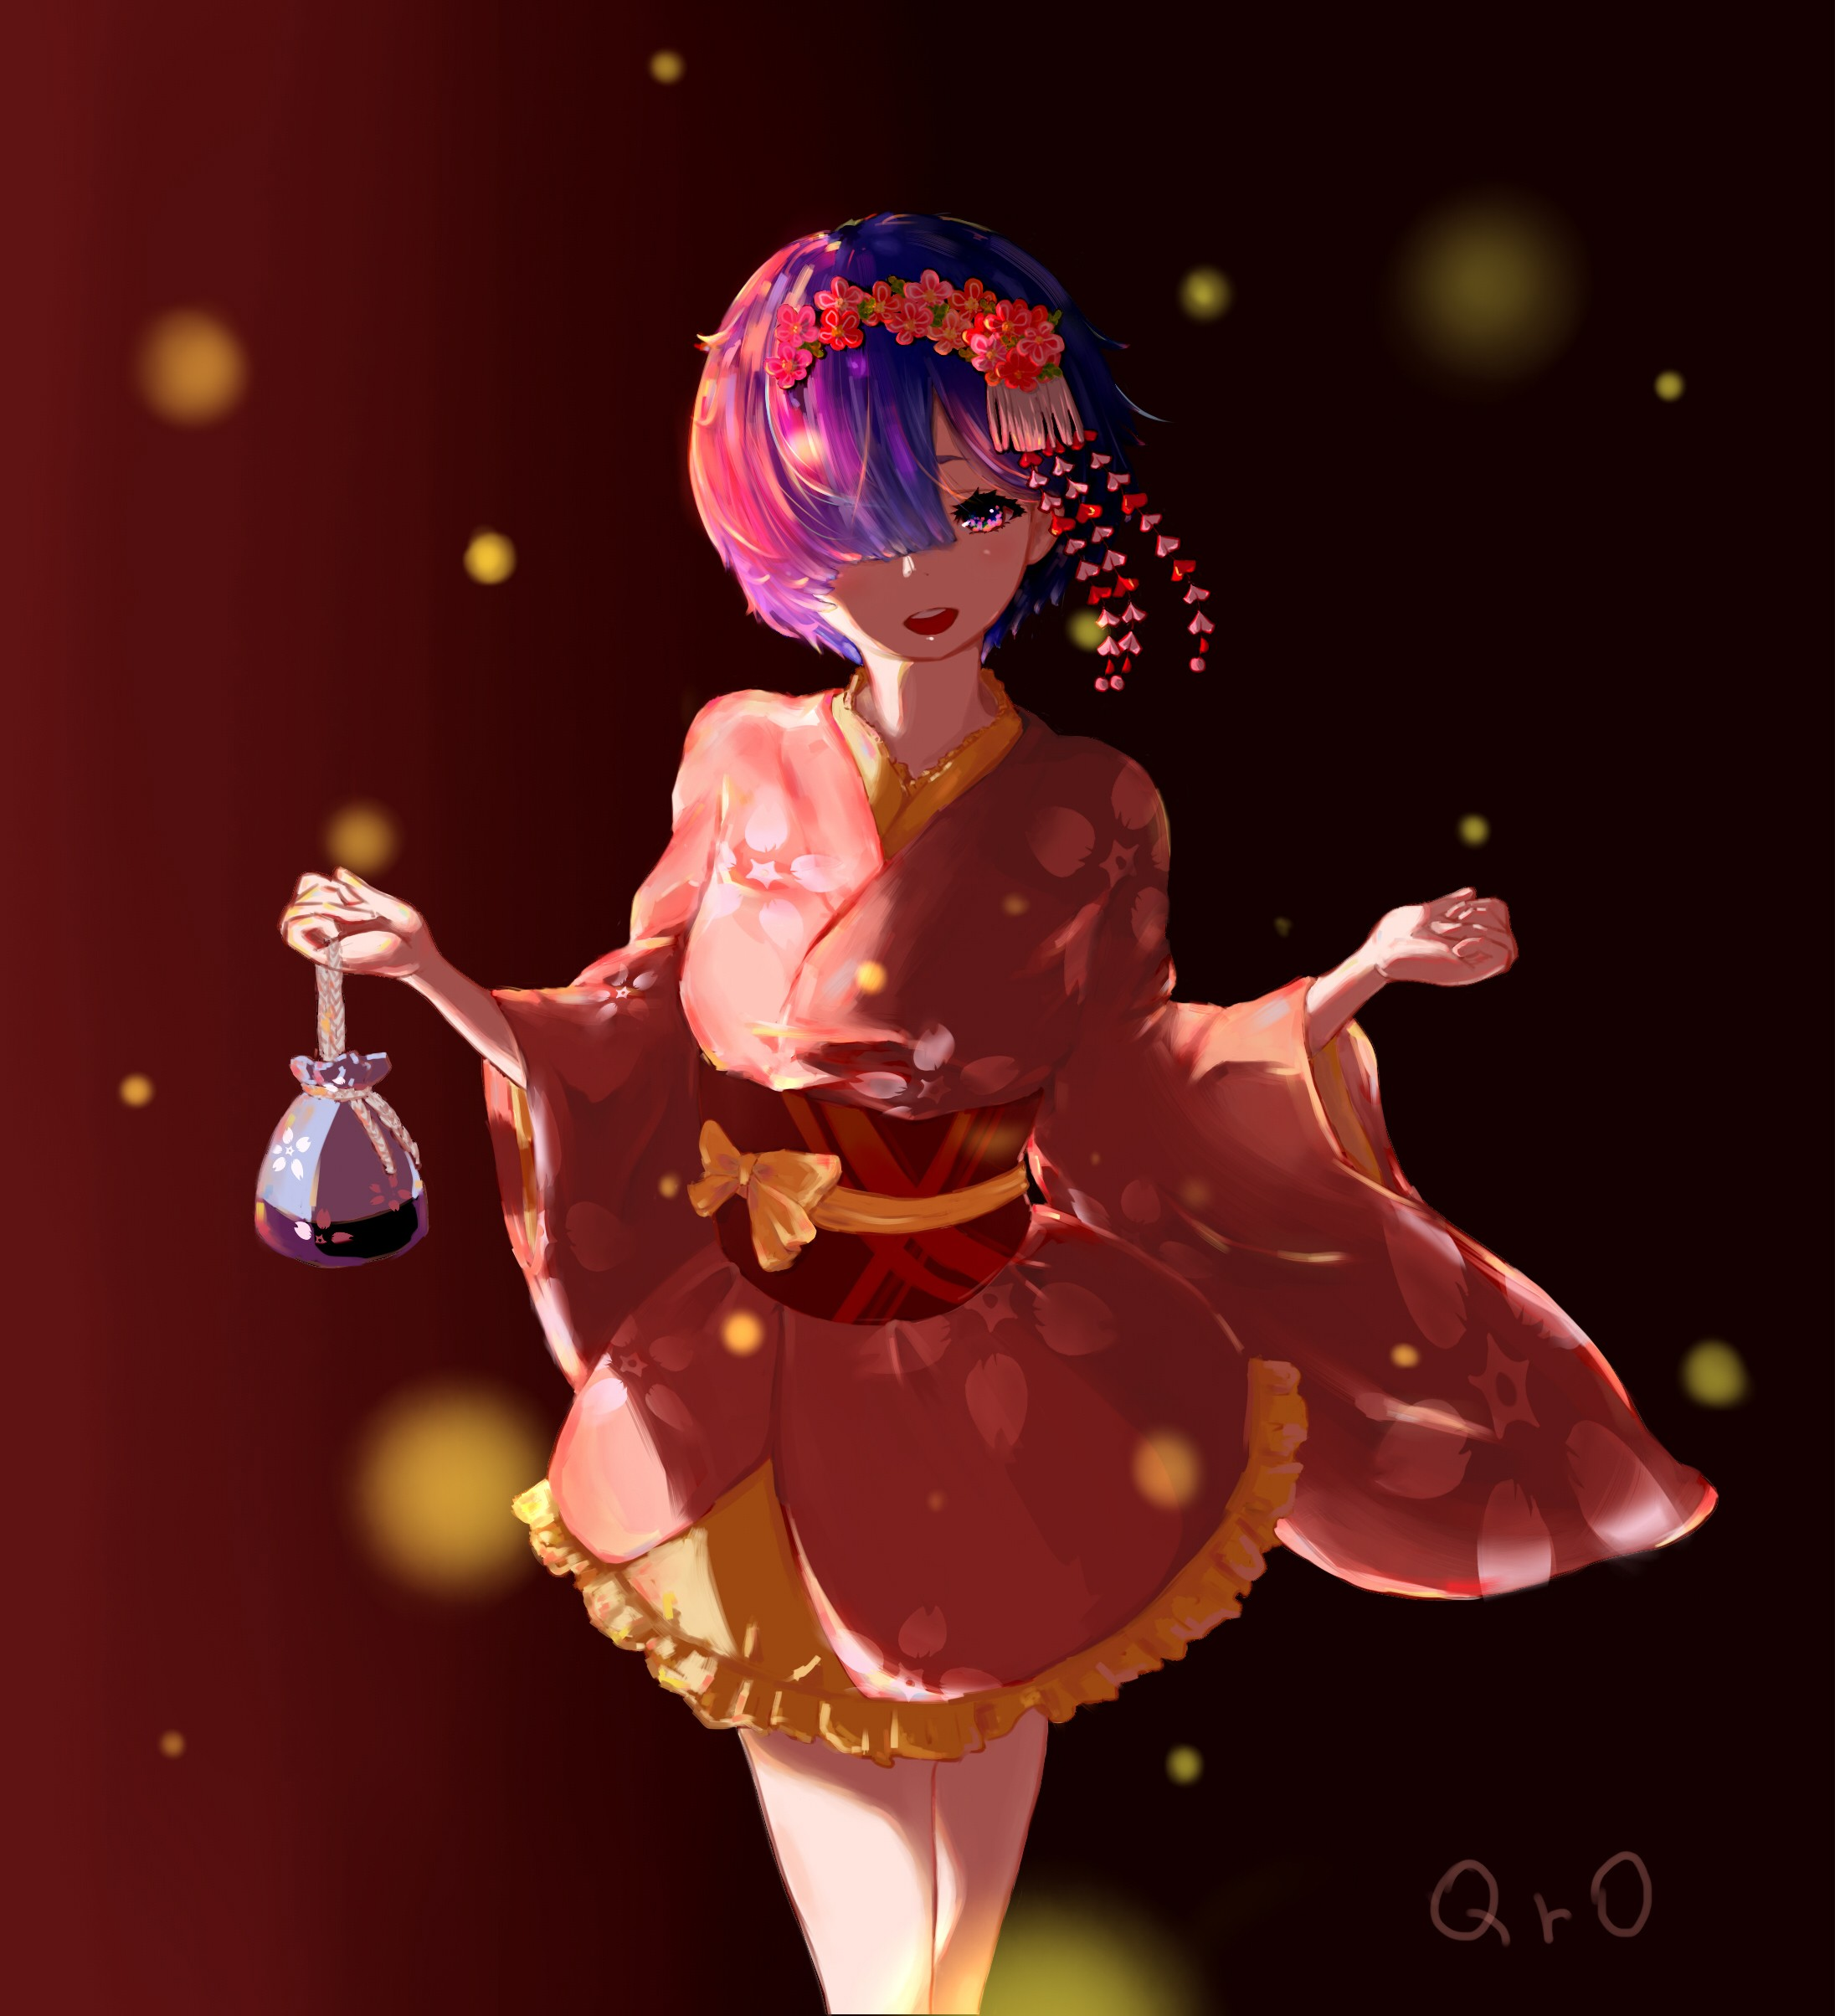 Anime 2192x2408 anime anime girls Re:Zero Kara Hajimeru Isekai Seikatsu Rem (Re: Zero) yukata short hair blue hair pink eyes kimono Japanese clothes